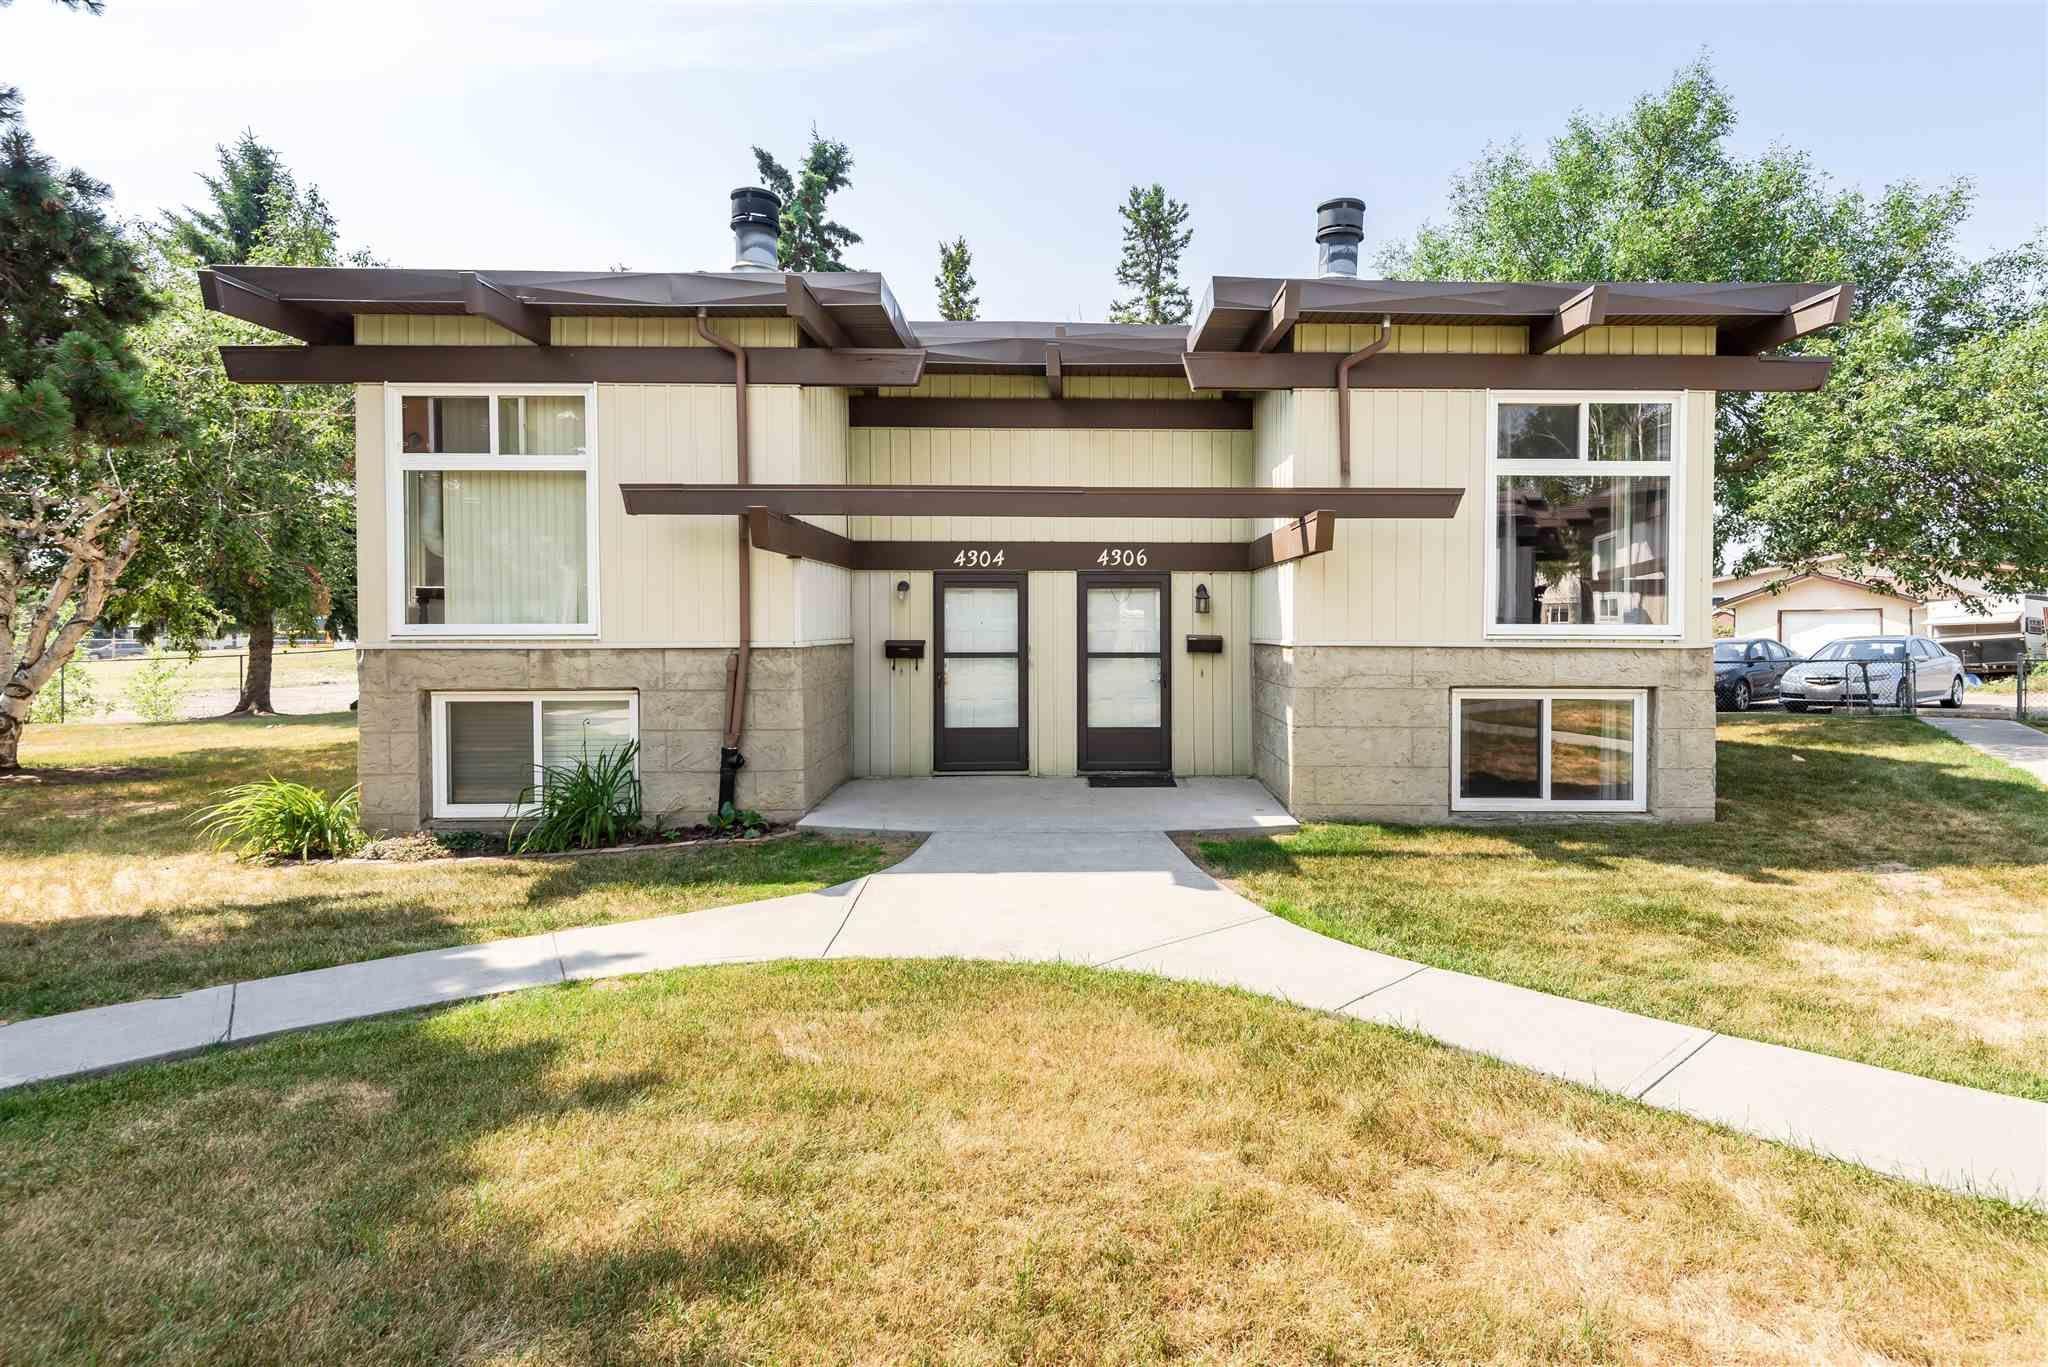 Main Photo: 4306 76 Street in Edmonton: Zone 29 House Half Duplex for sale : MLS®# E4254667